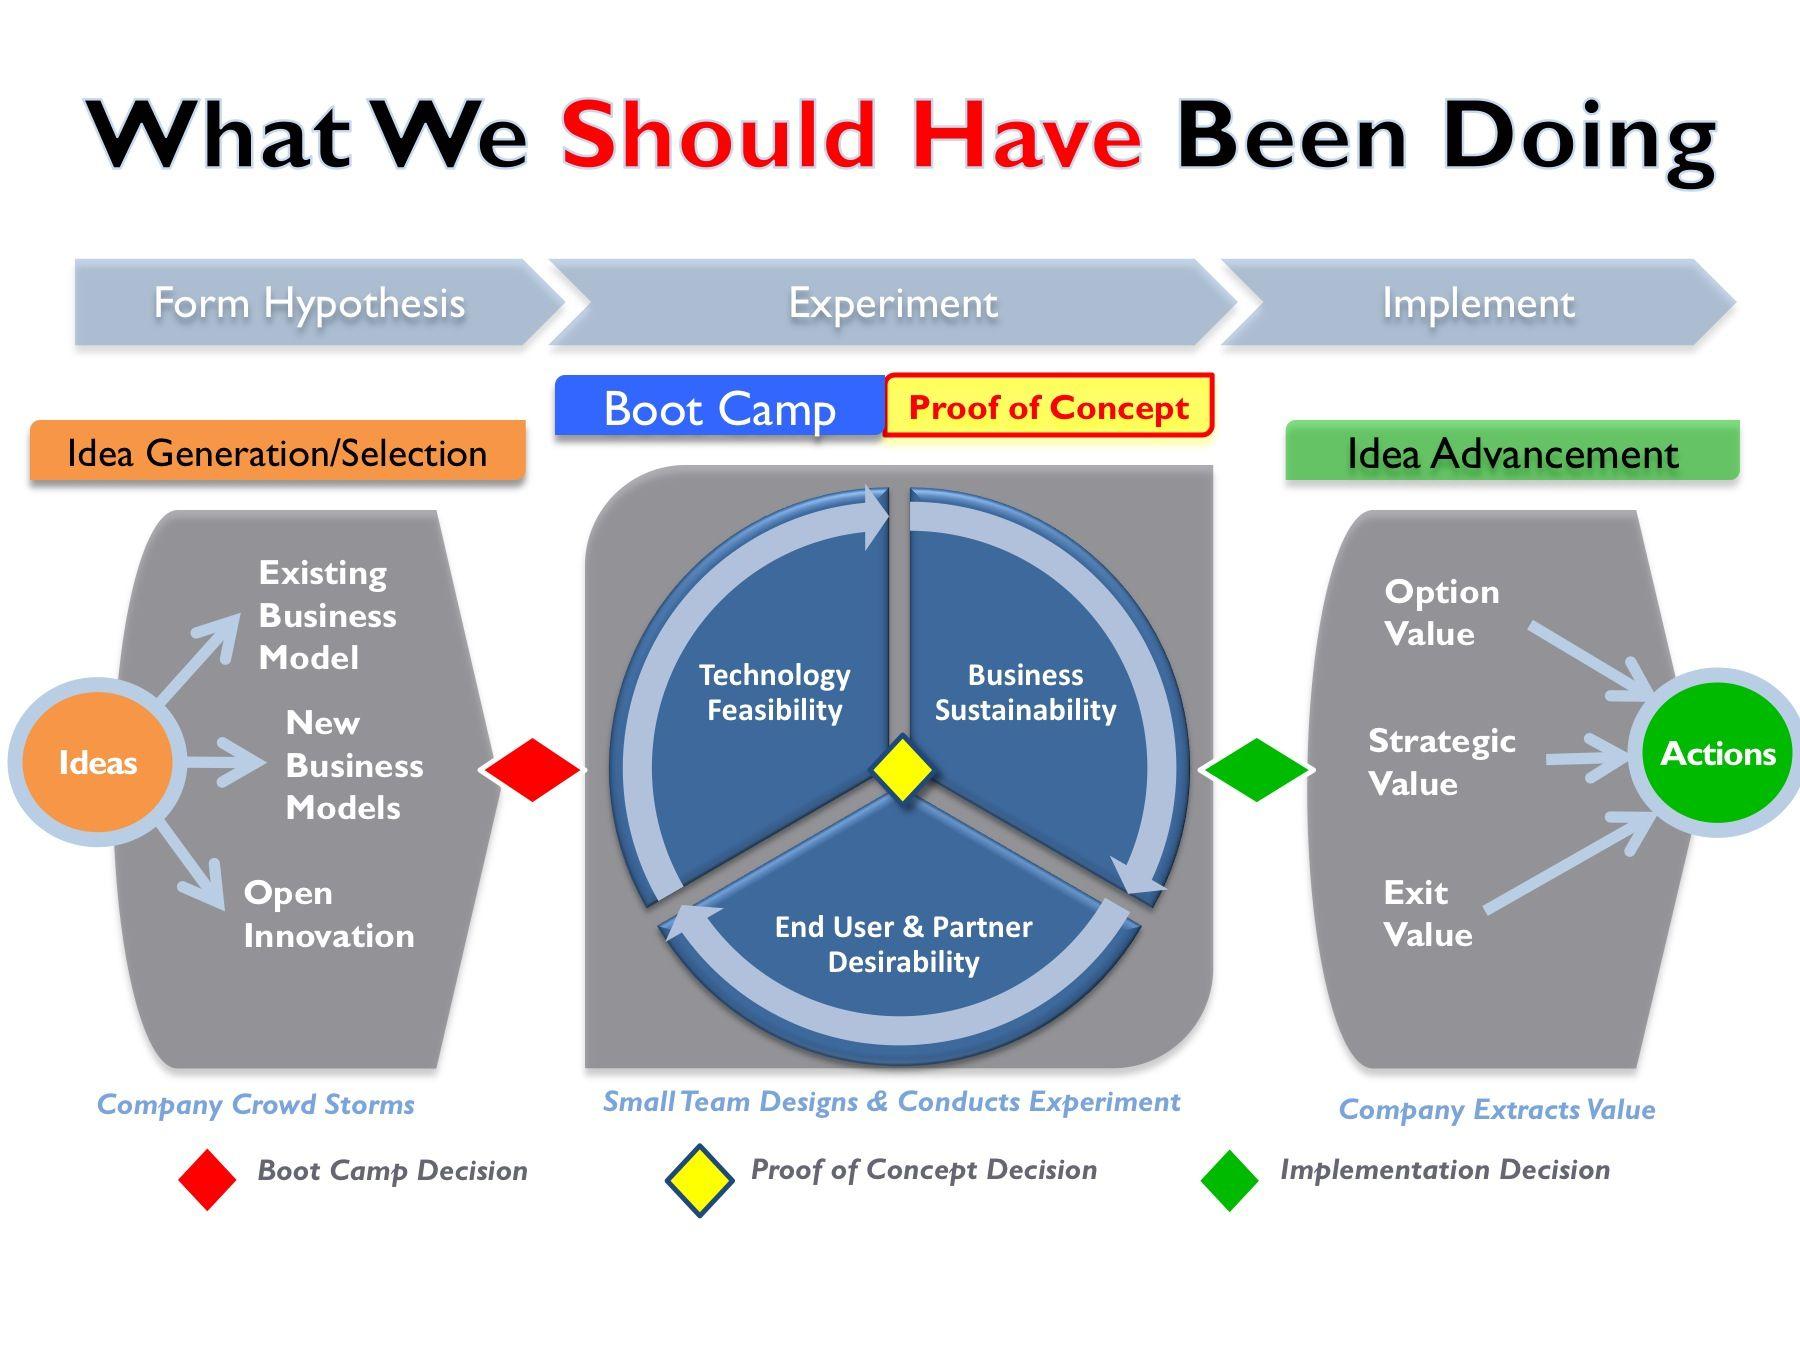 qualcomm's corporate entrepreneurship program - lessons learned, Presentation templates